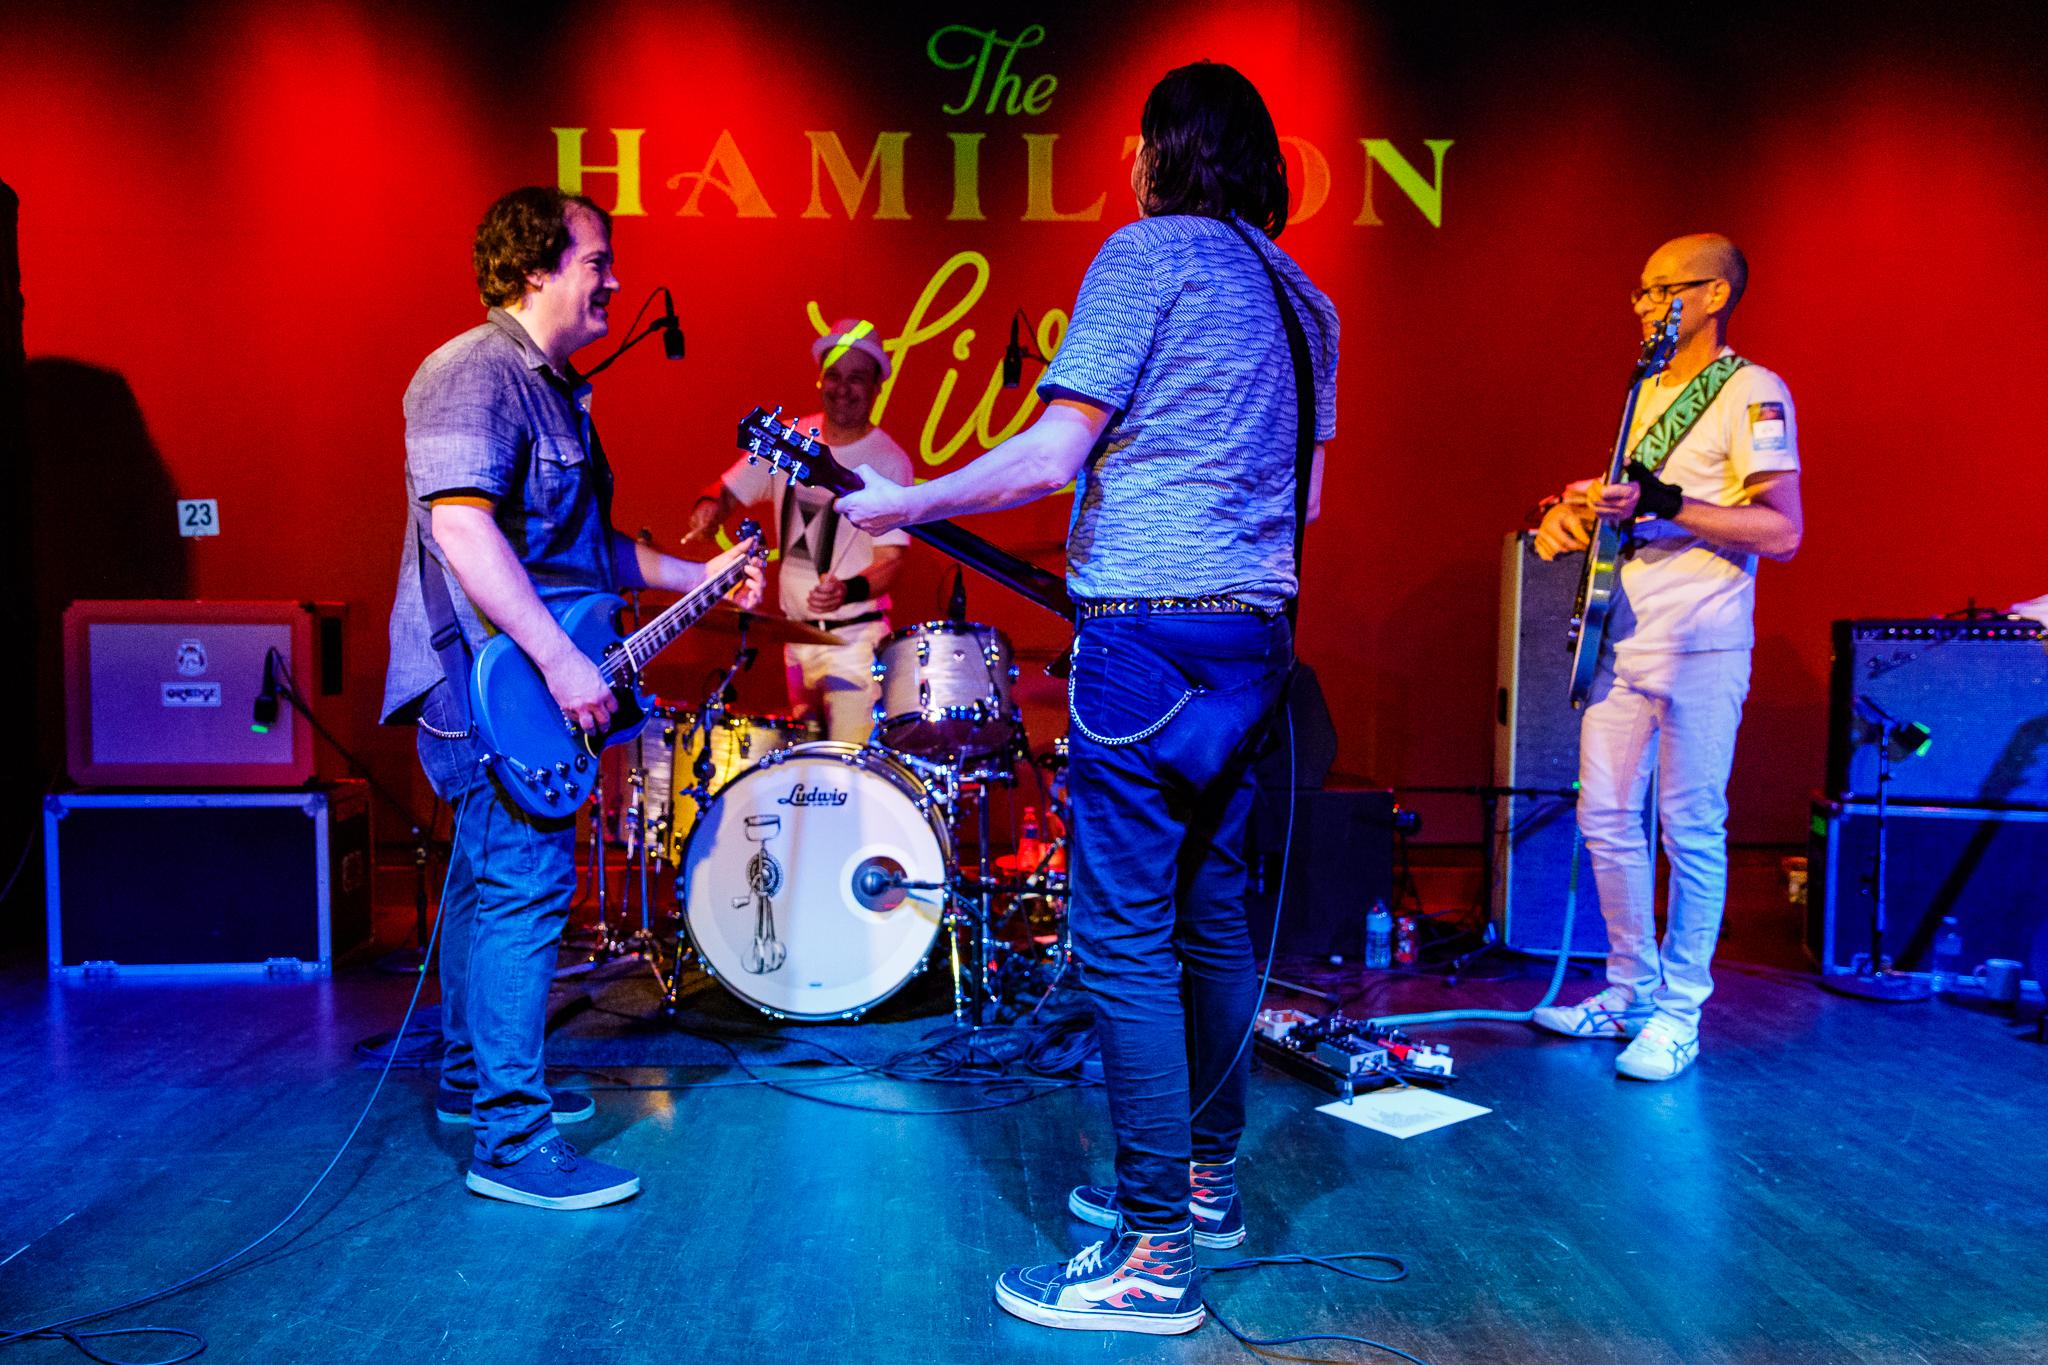 The Posies performing at The Hamilton in Washington, DC - 6/16/2018 (photo by Matt Condon / @arcane93)